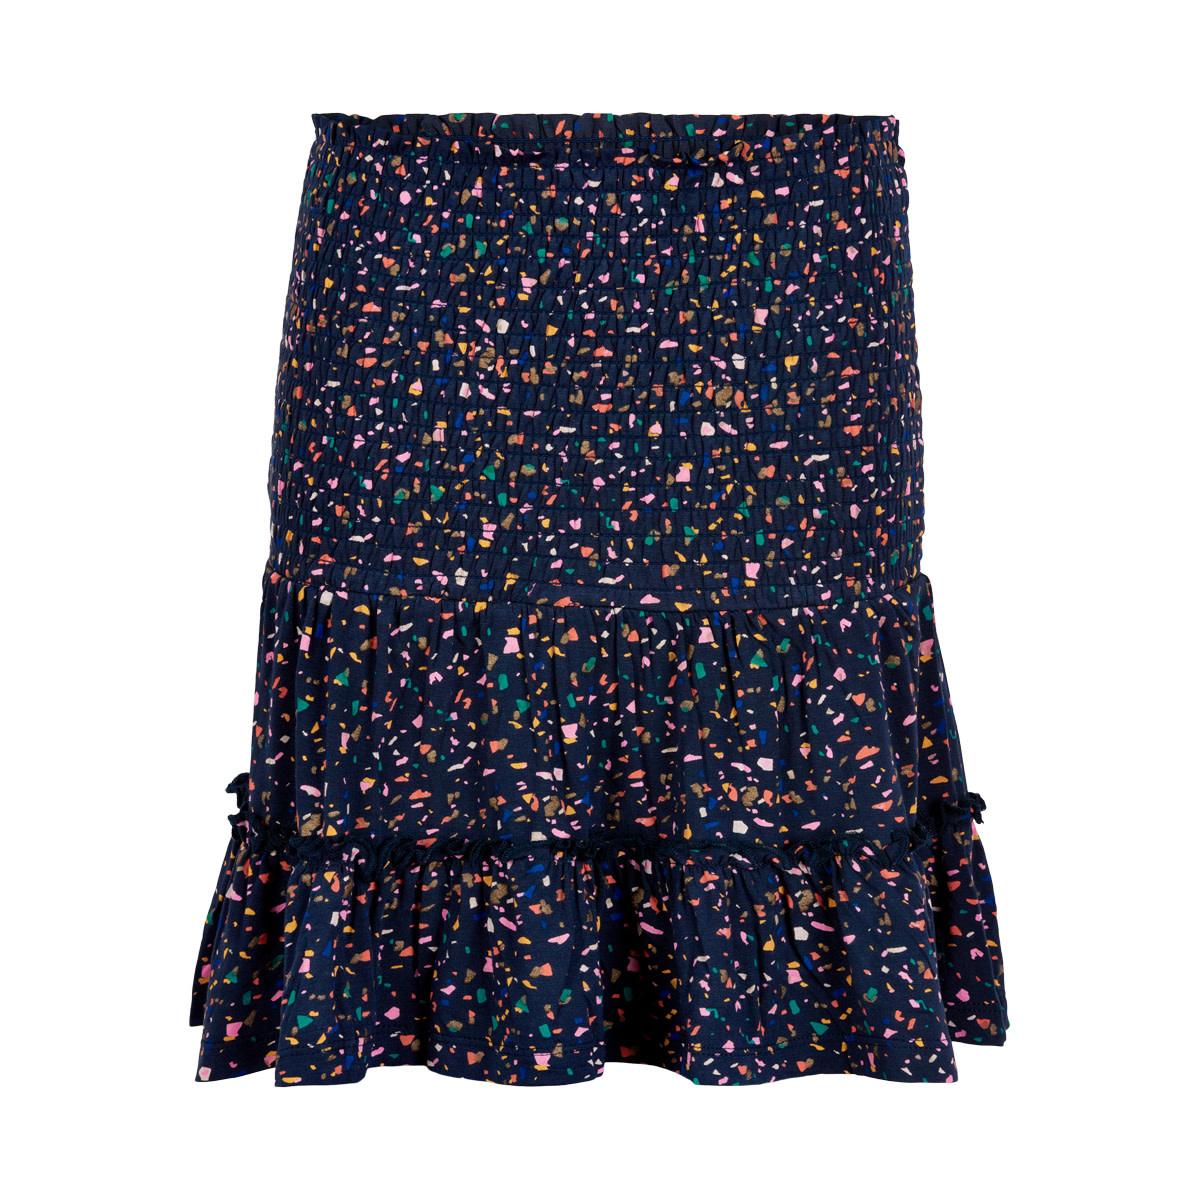 Ulise Skirt - Confetti Print